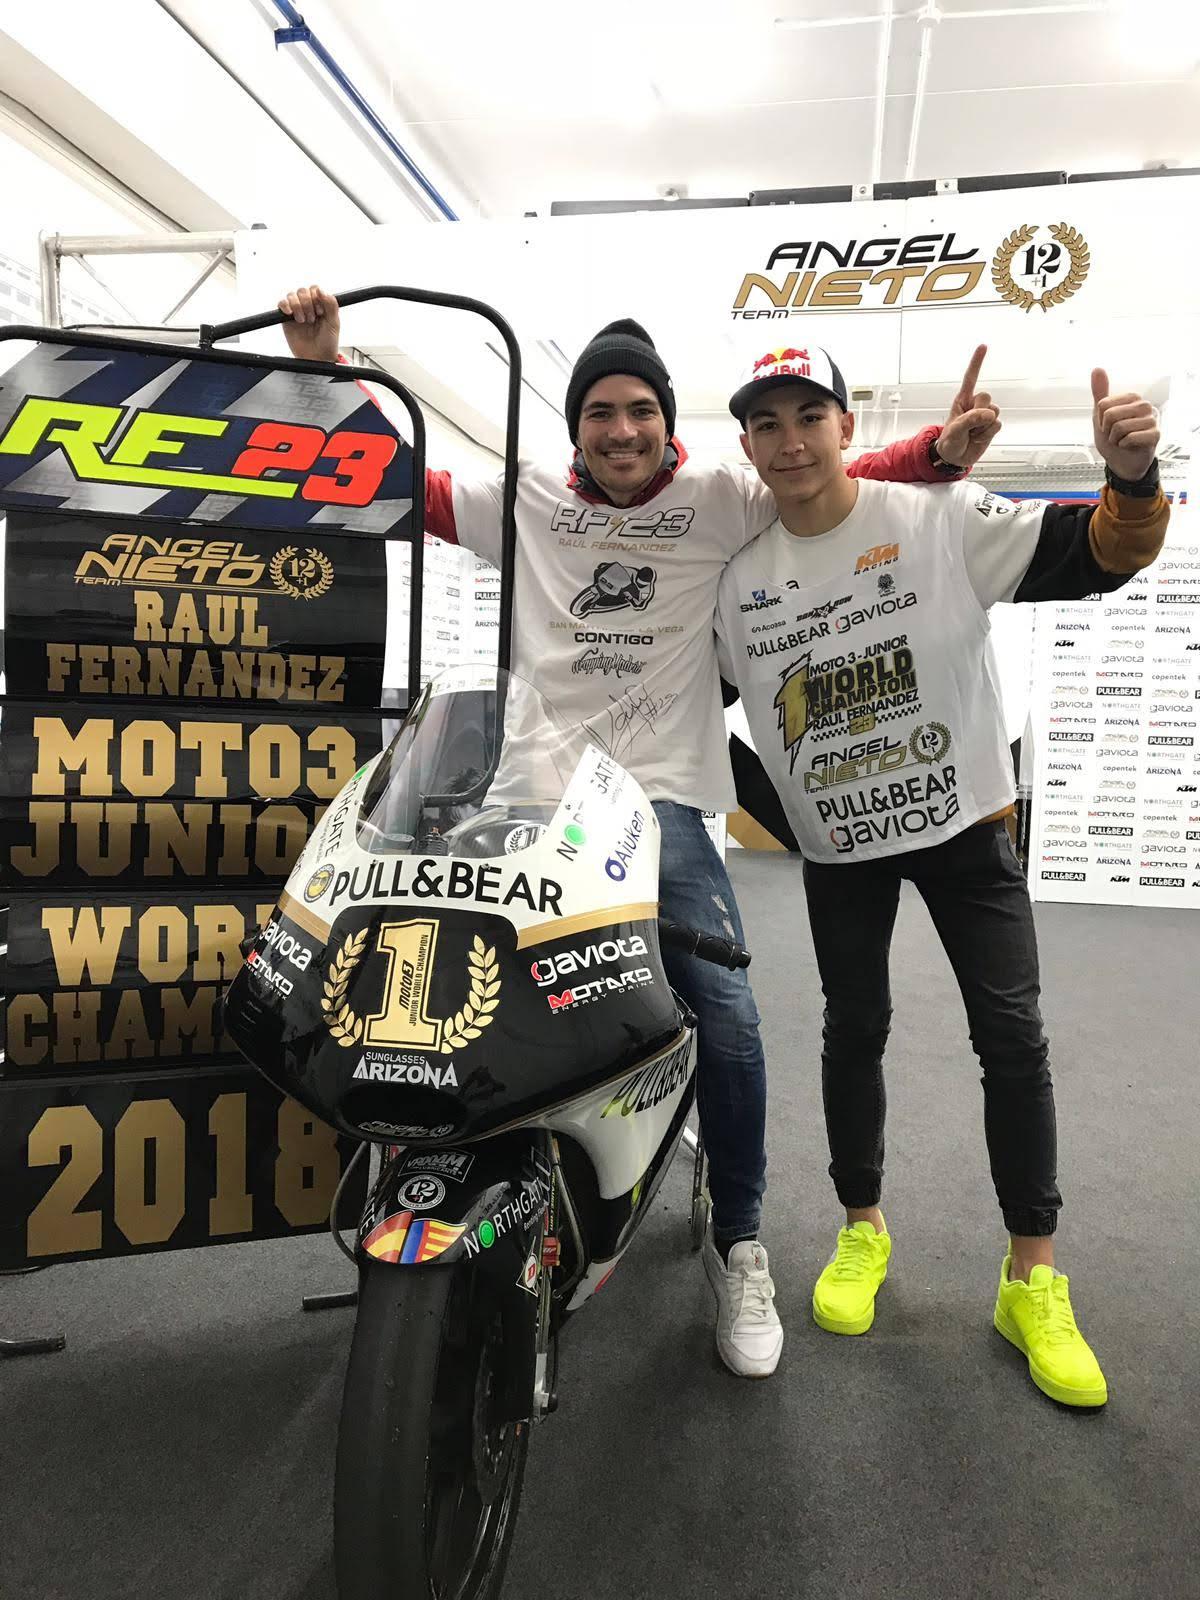 raul-fernandez-se-proclama-campeon-del-fim-cev-repsol-moto3